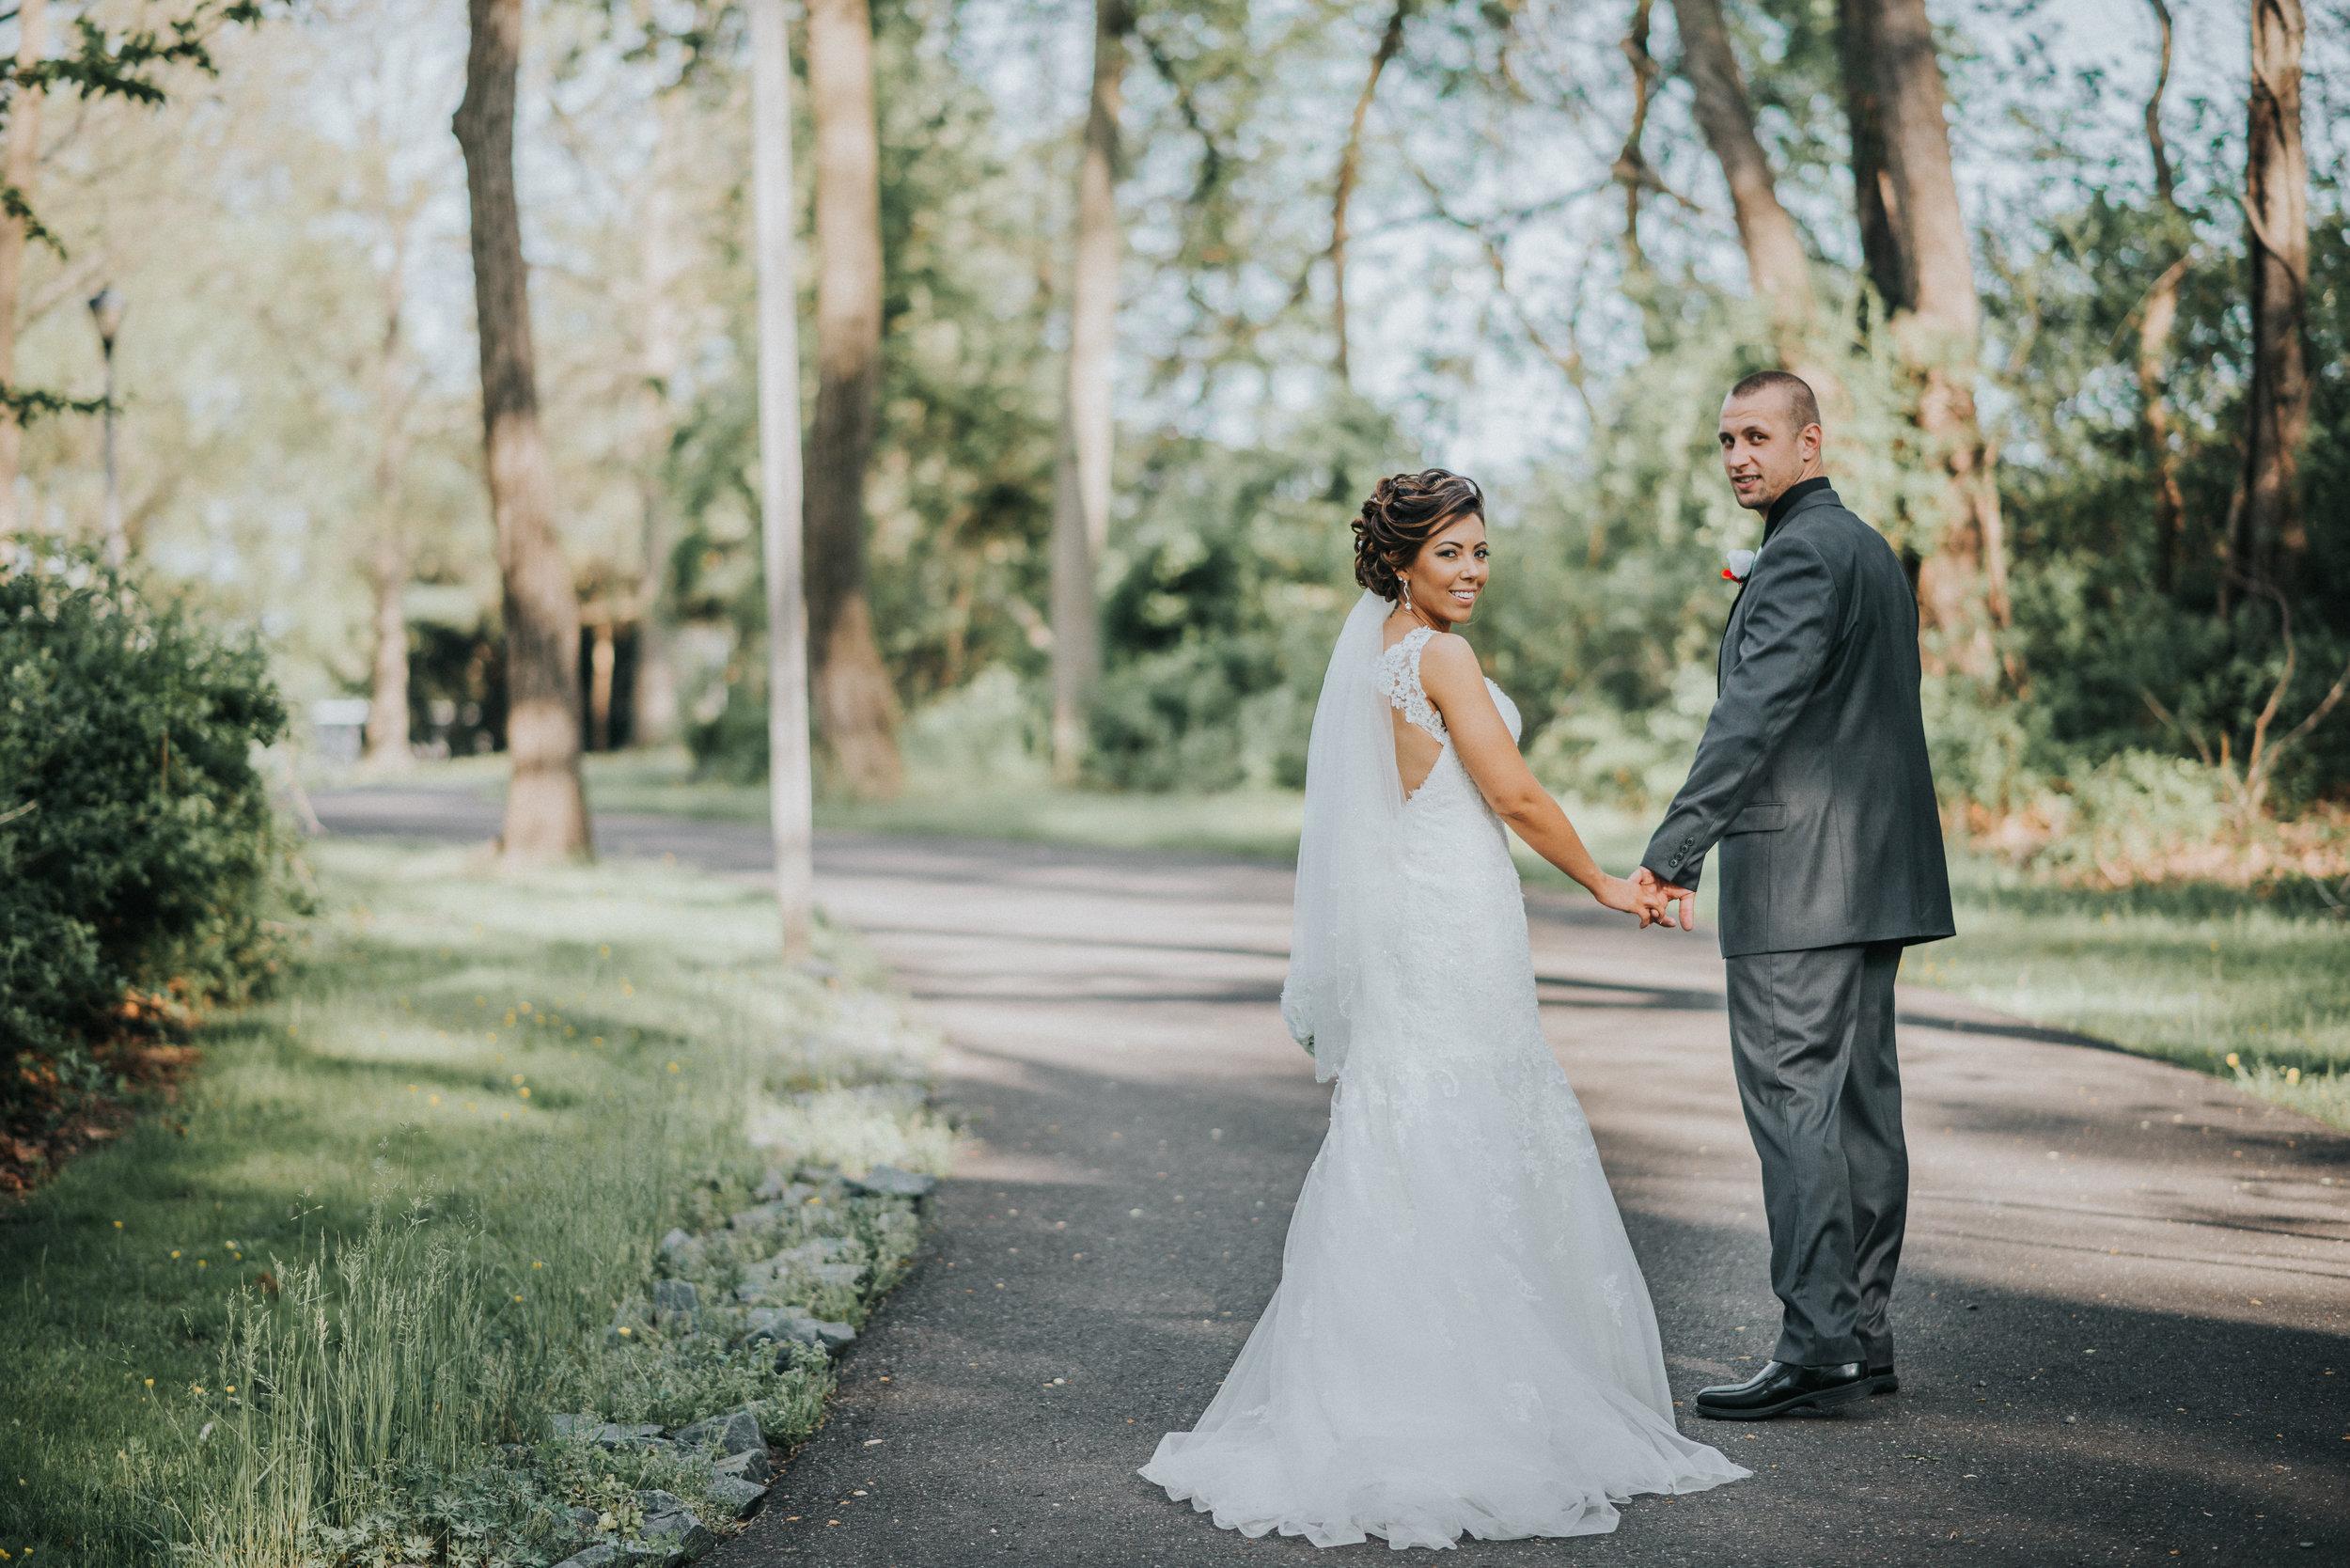 Christina-and-Gene-Wedding-Marla-Rain-Photography-273.jpg